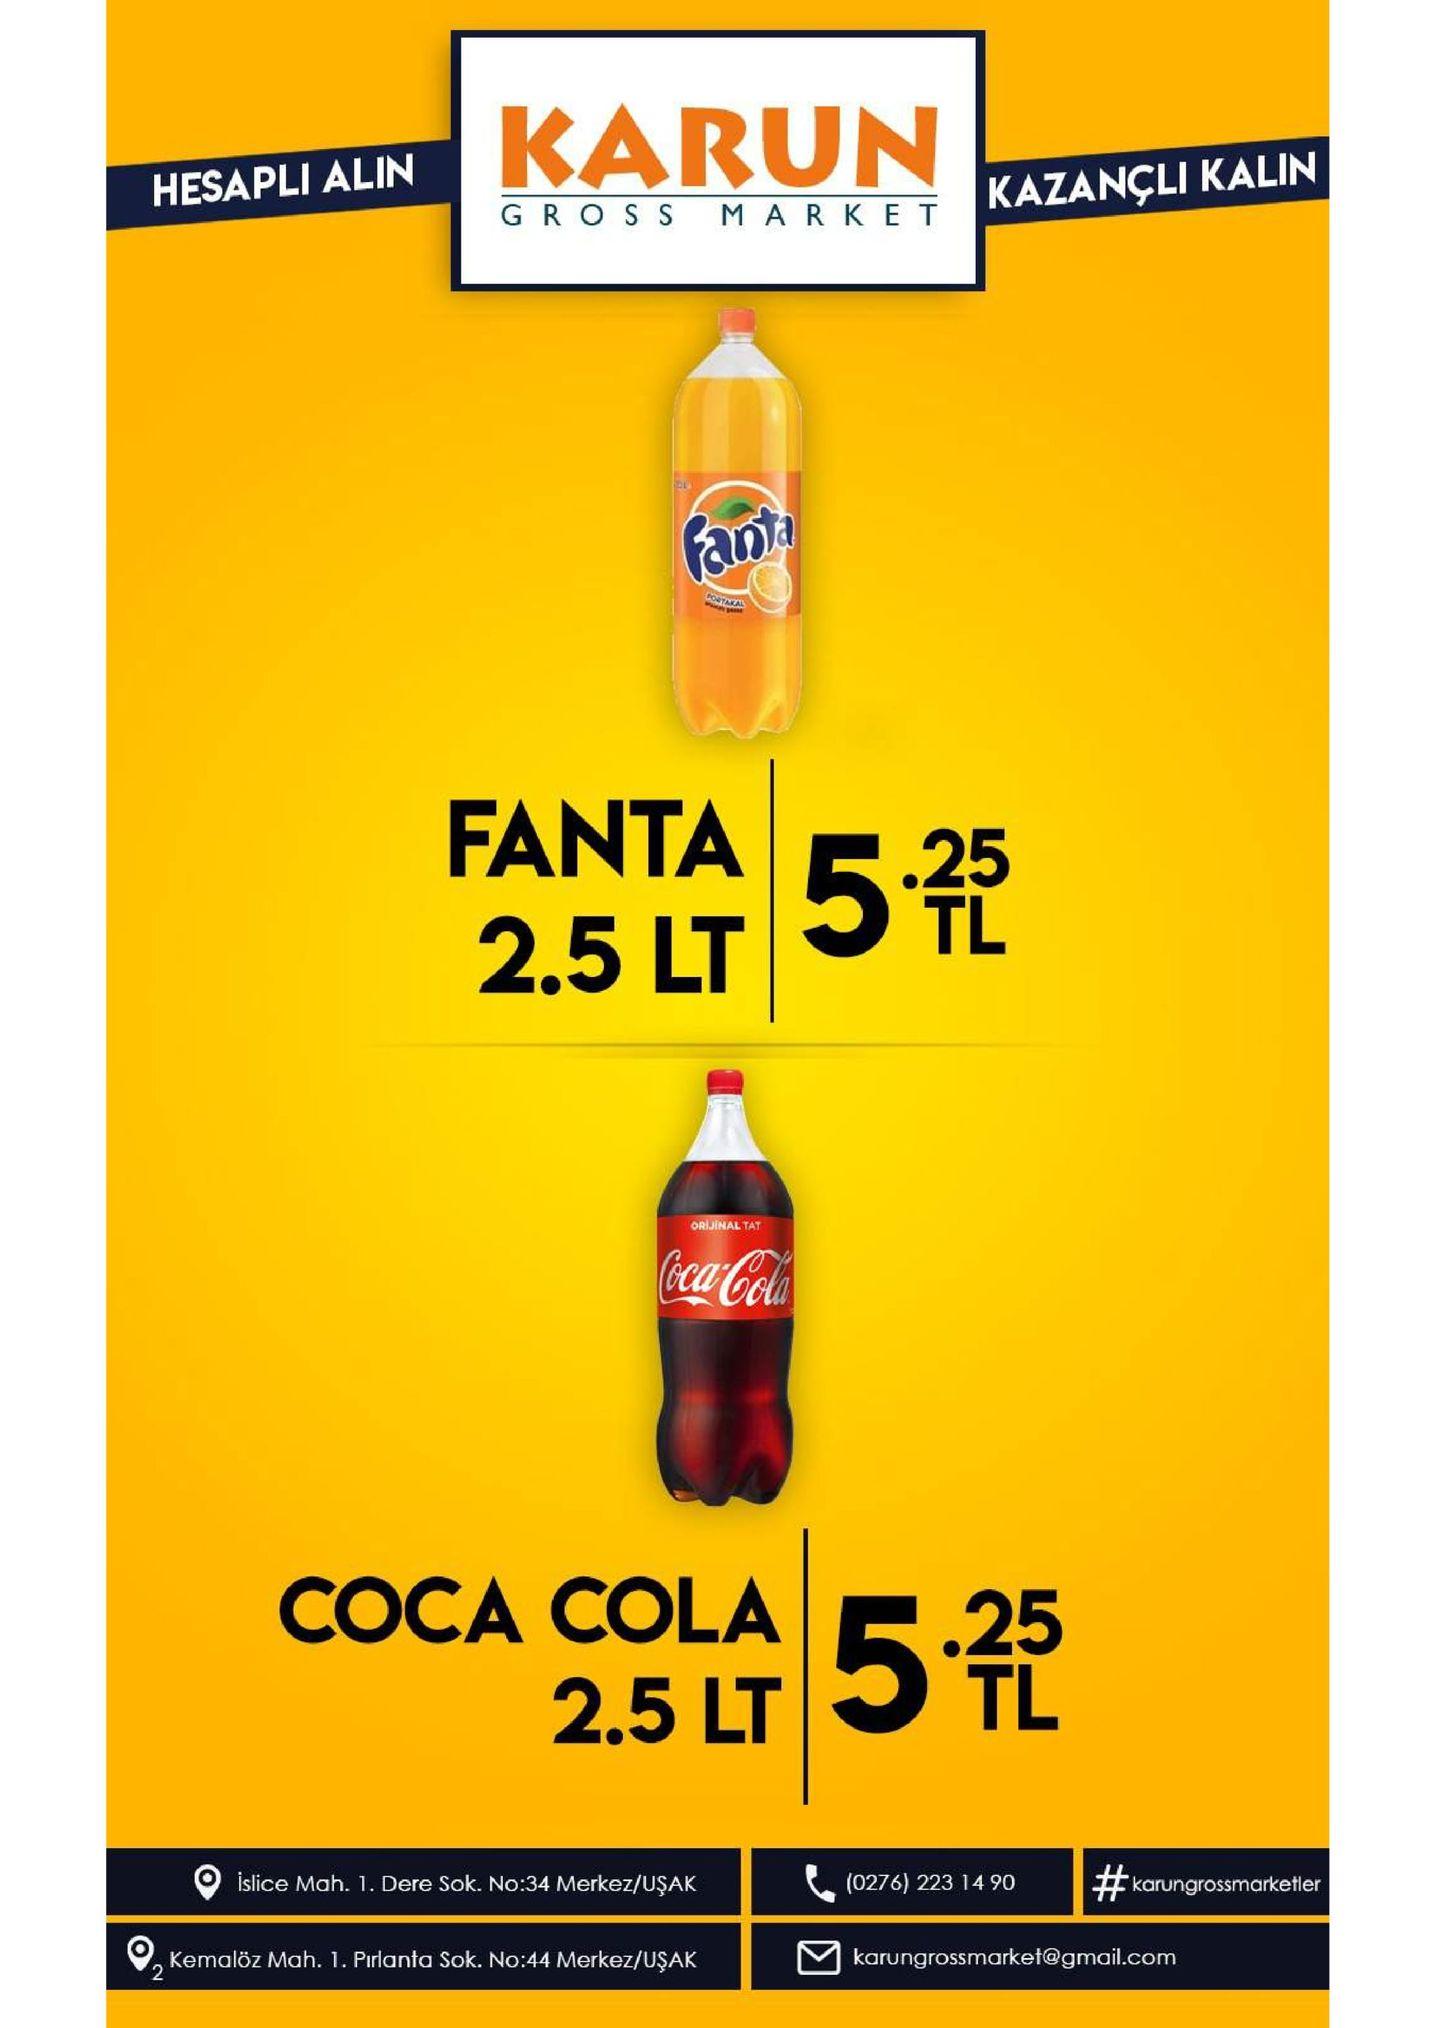 karun kazancli kalin hesapli alin gros s mark e t fanty poatakal ease fanta52 .25 2.5 lt orijinal tat coca-cola 5fh coca cola .25 tl 2.5 lt | # islice mah. 1 dere sok. no:34 merkez/uşak (0276) 223 14 90 karungrossmarketler karungrossmarket@gmail.com kemalöz mah. 1. pirlanta sok. no:44 merkez/uşak 2